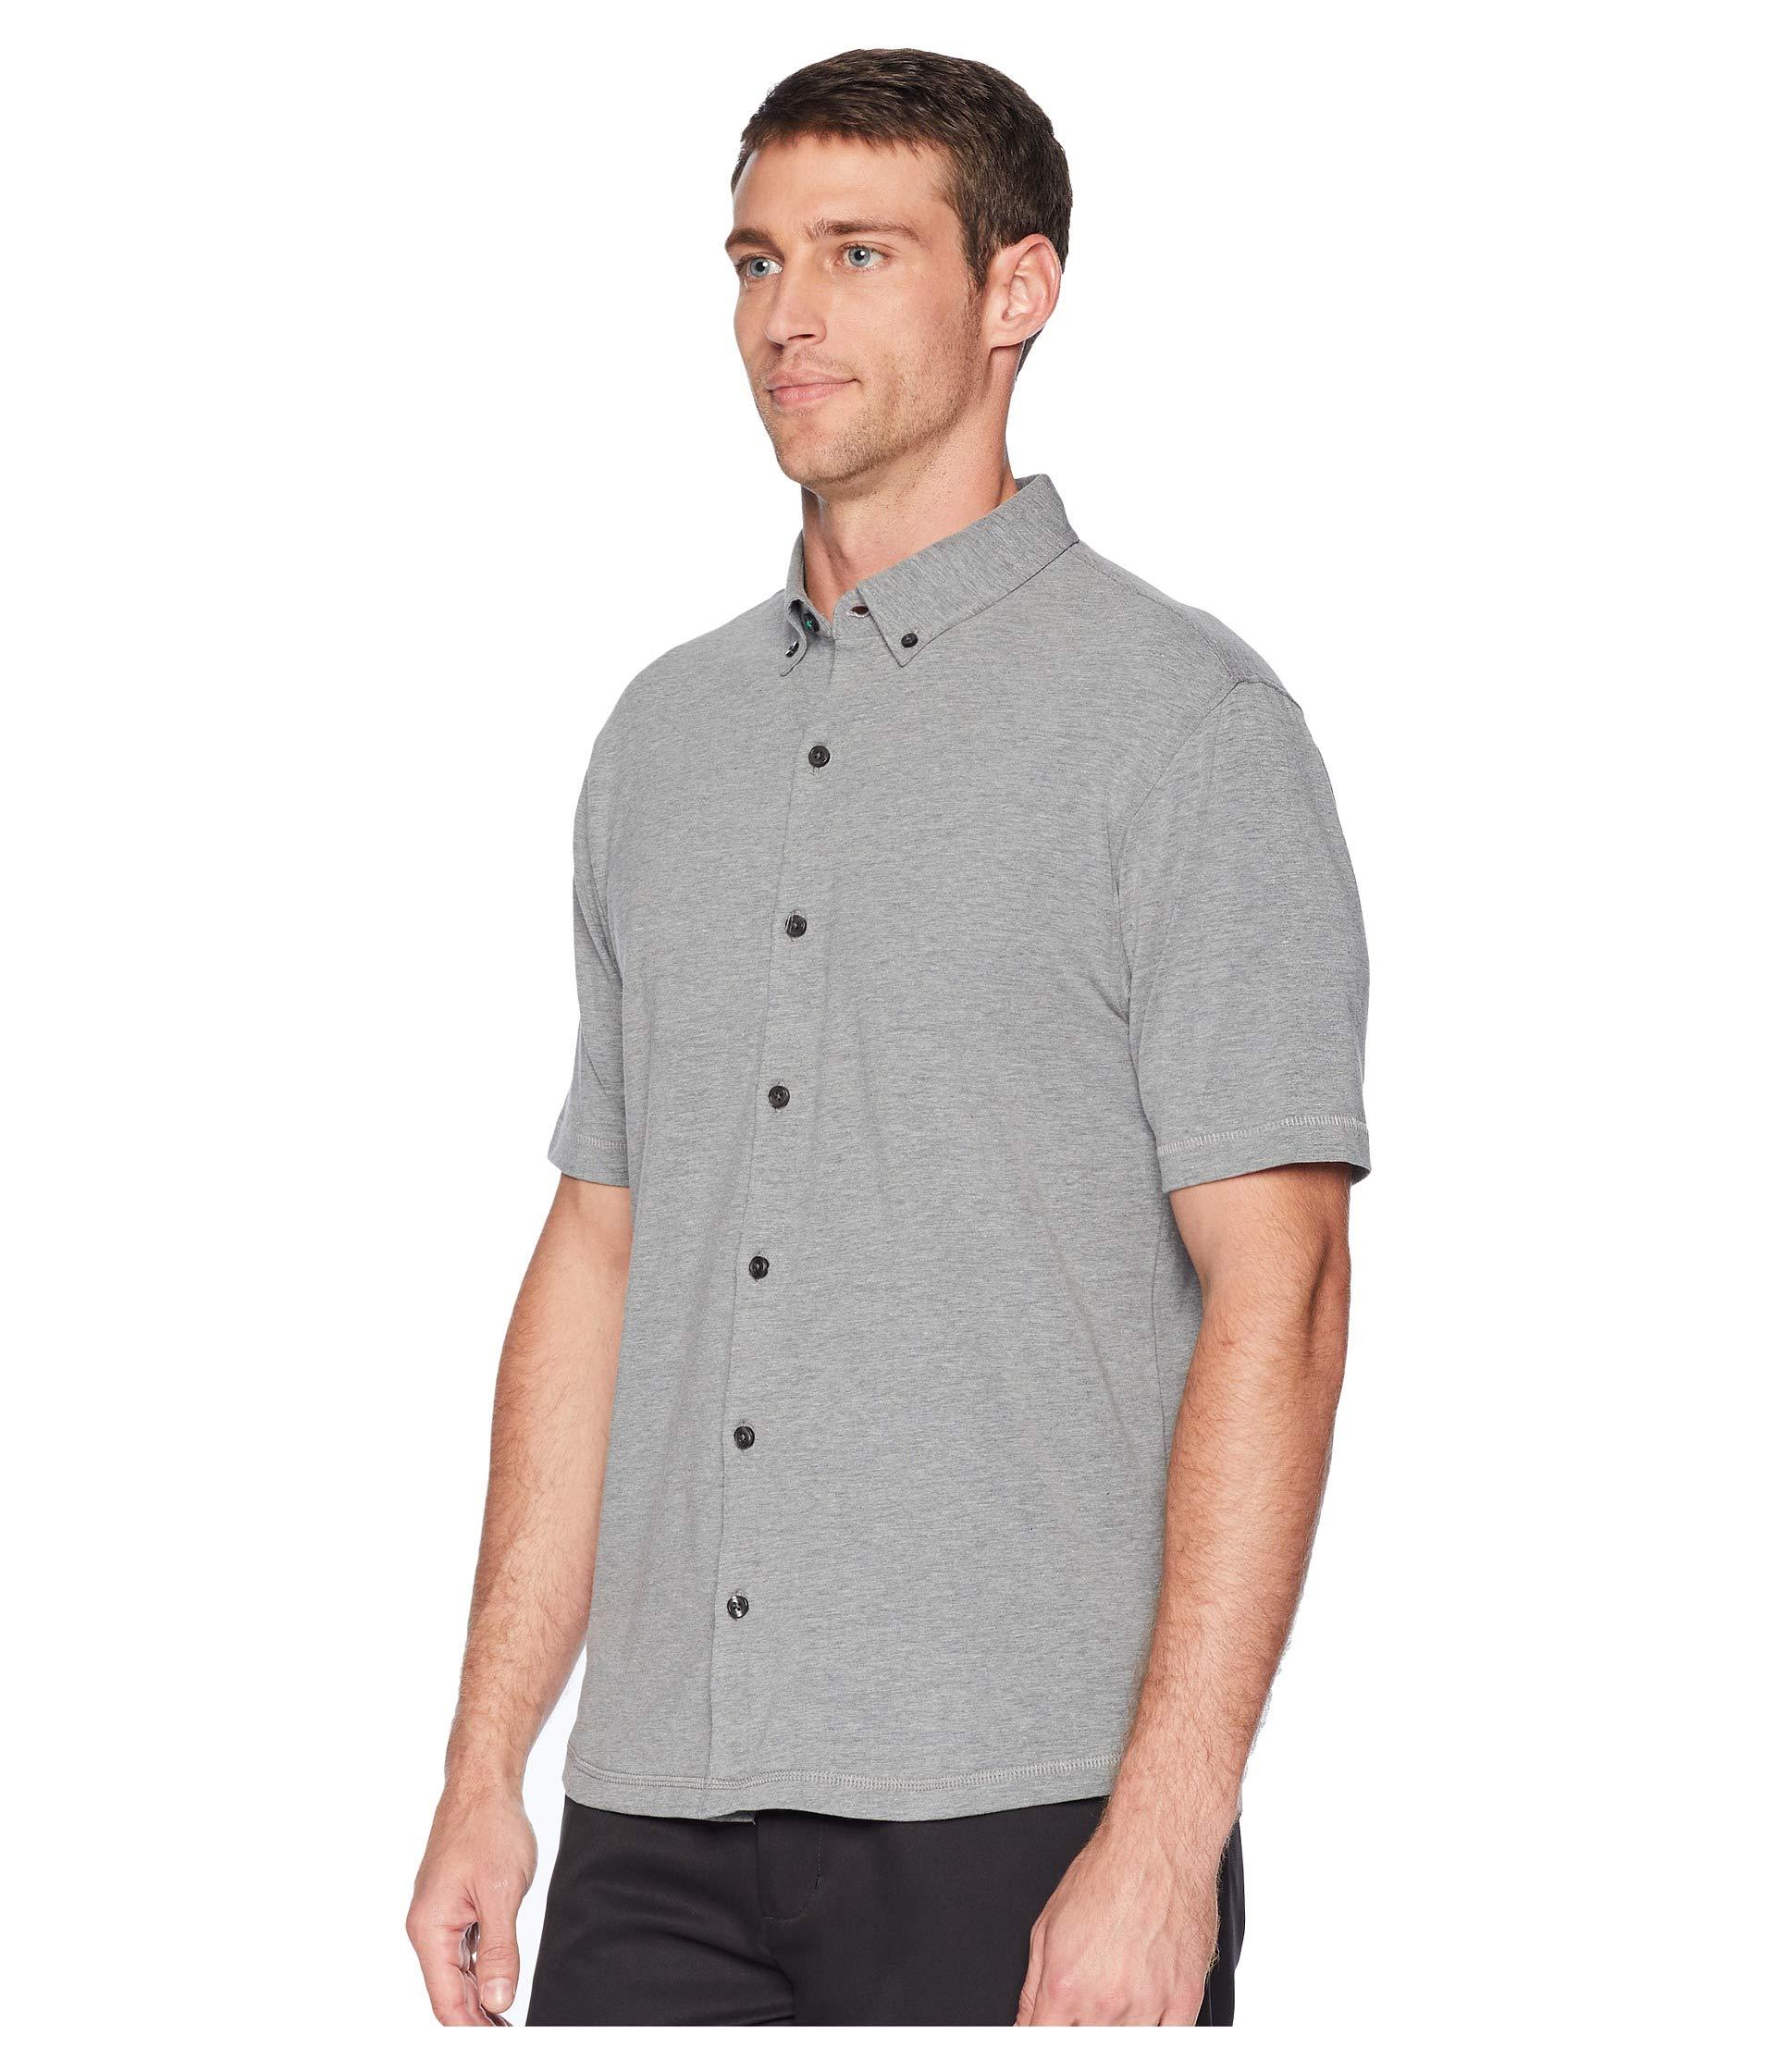 Linksoul Grey Shirt Dark Ls1184 Heather xwB81Rxq